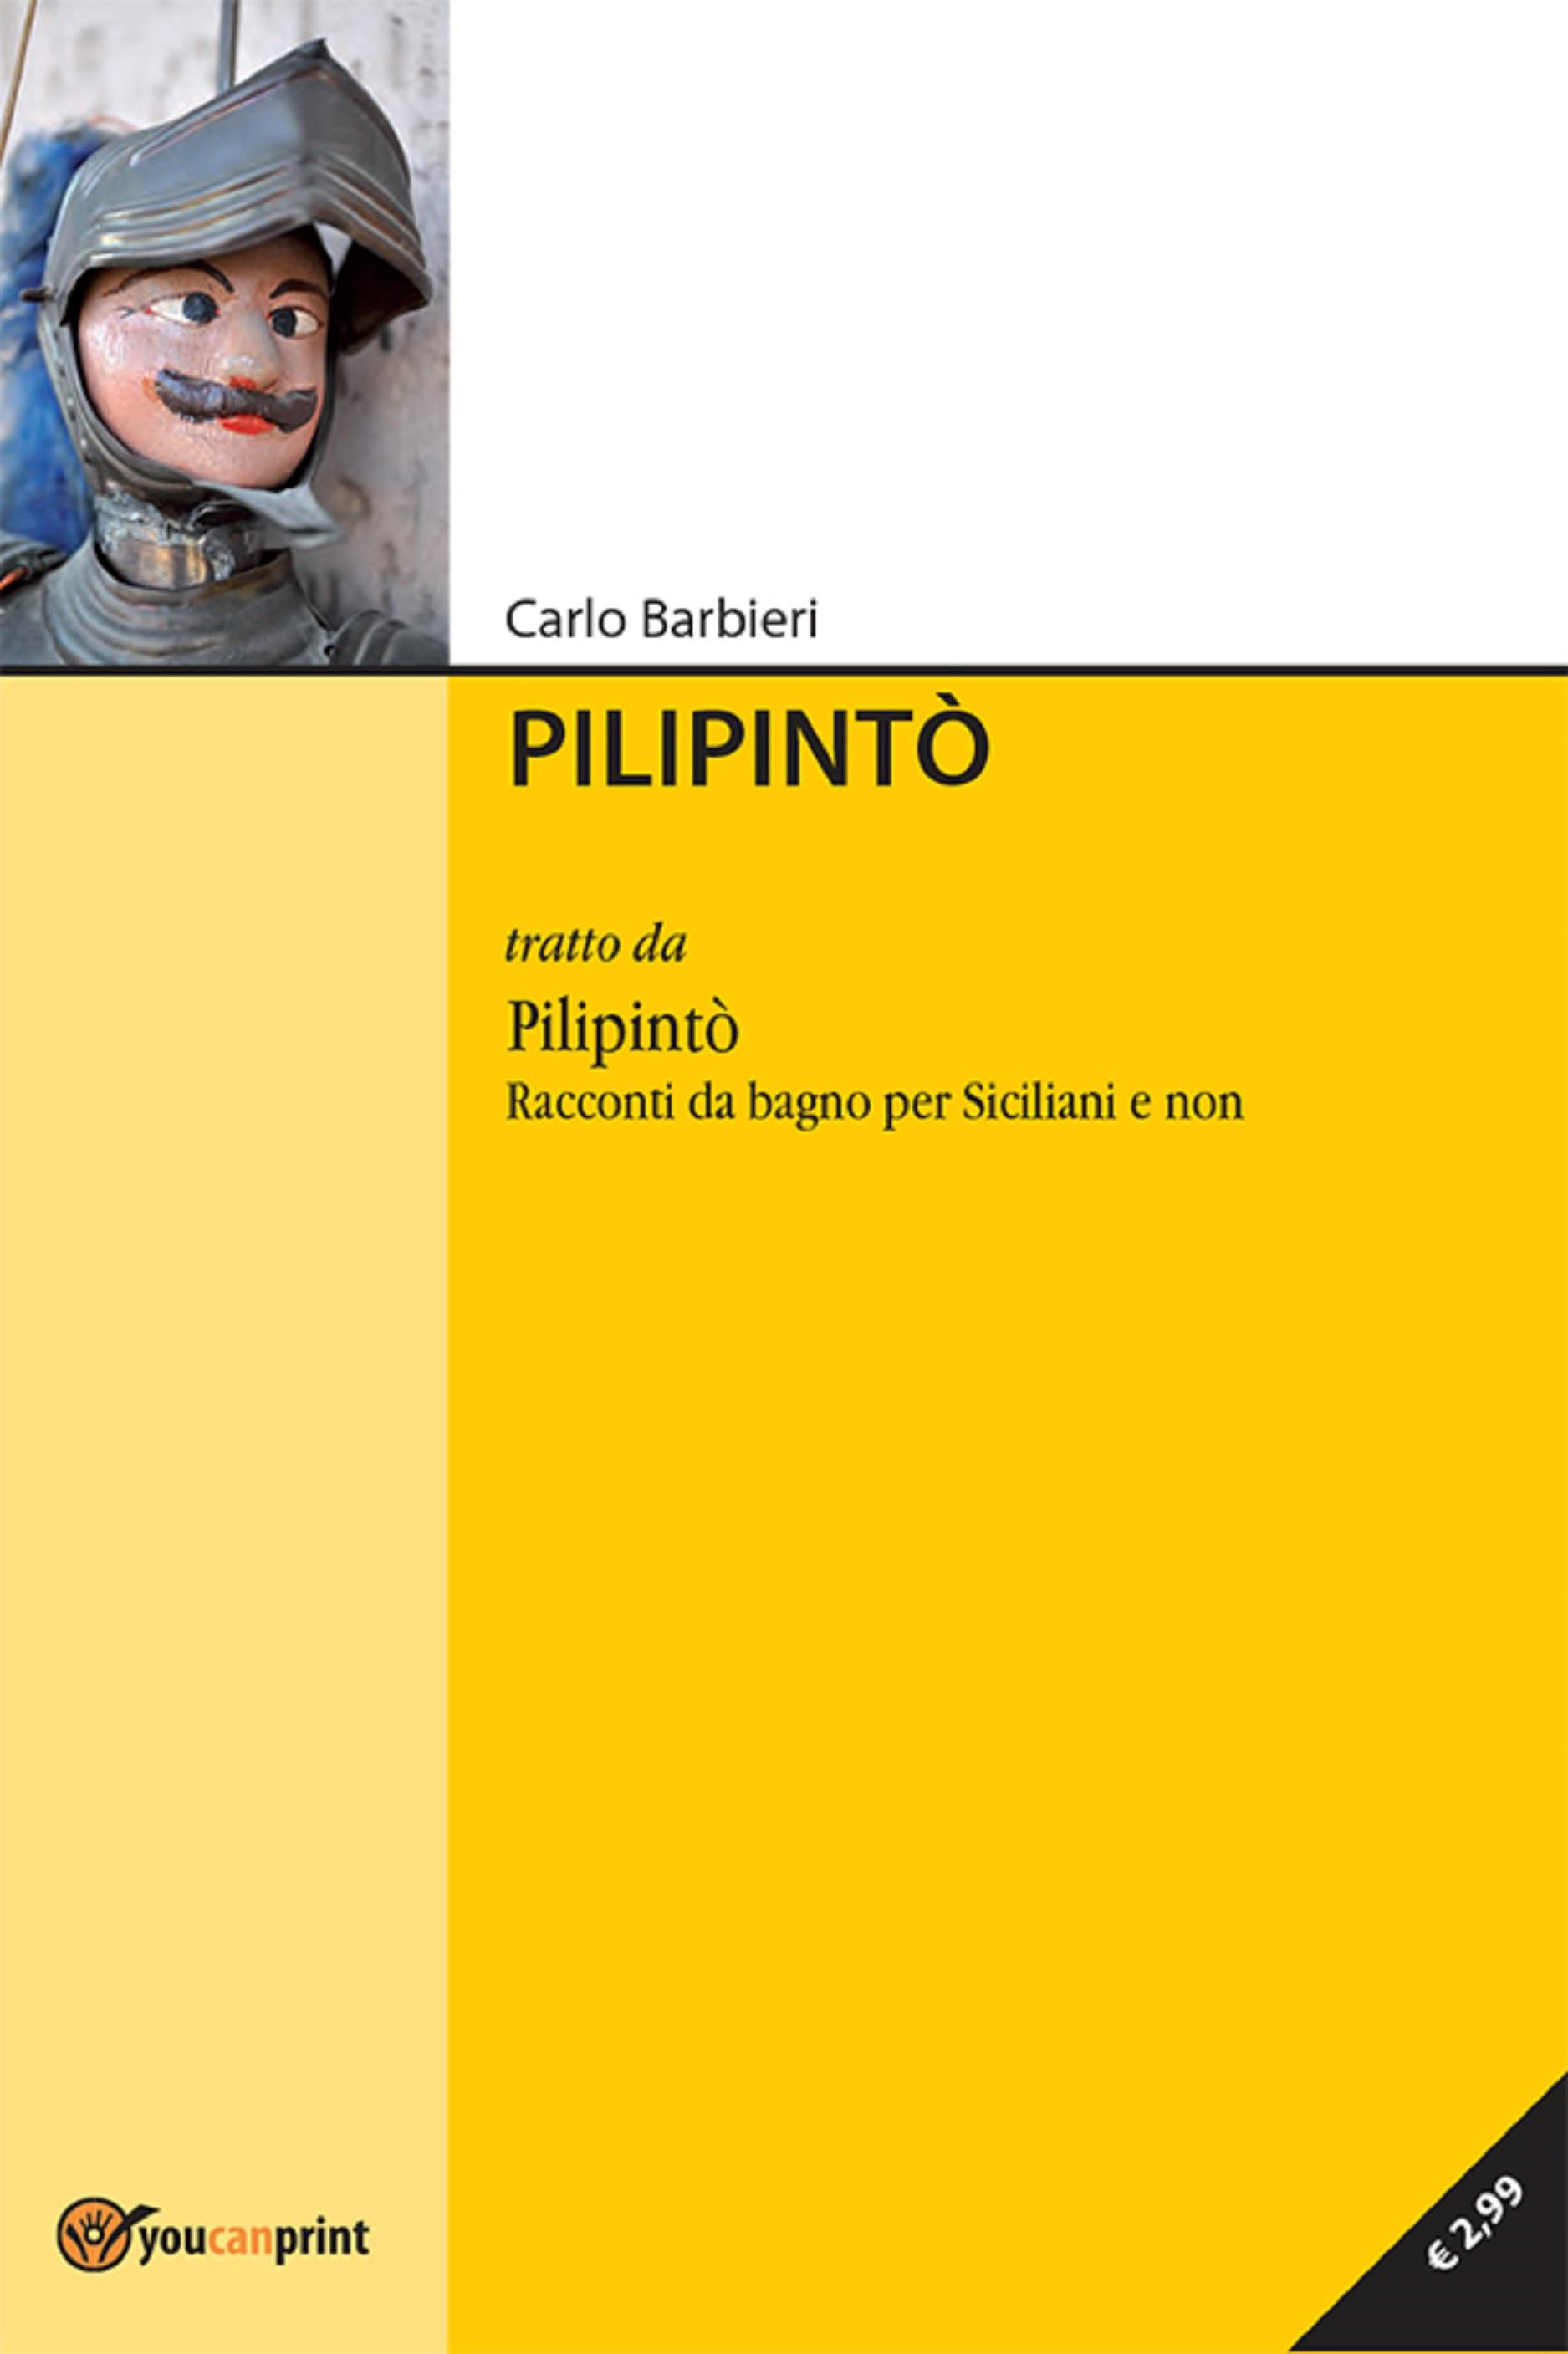 Pilipintò